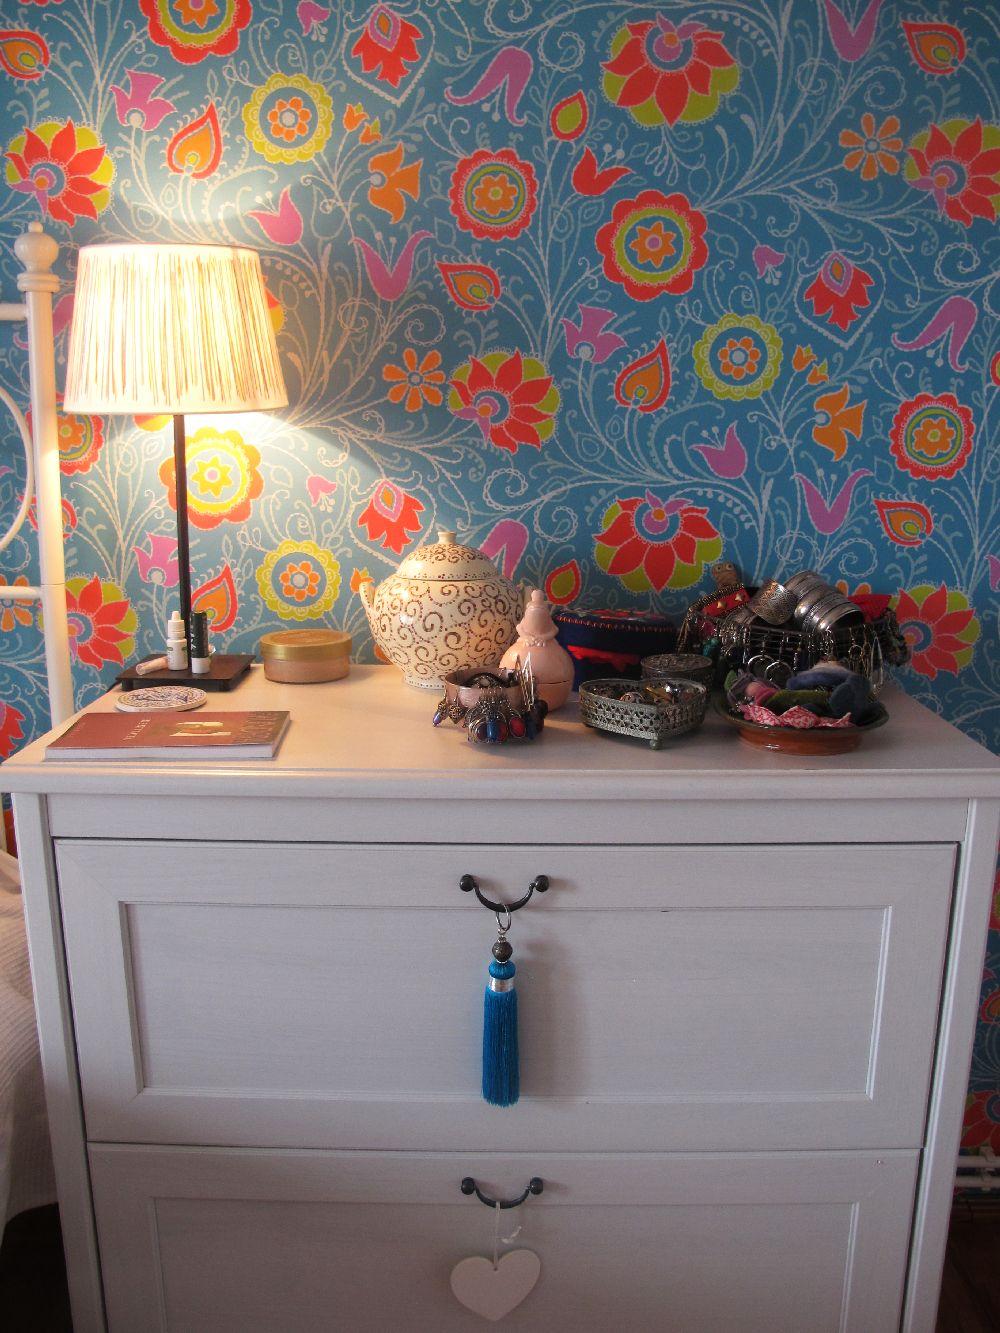 adelaparvu.com despre apartament 3 camere colorat in Sibiu, Foto Adela Parvu (85)